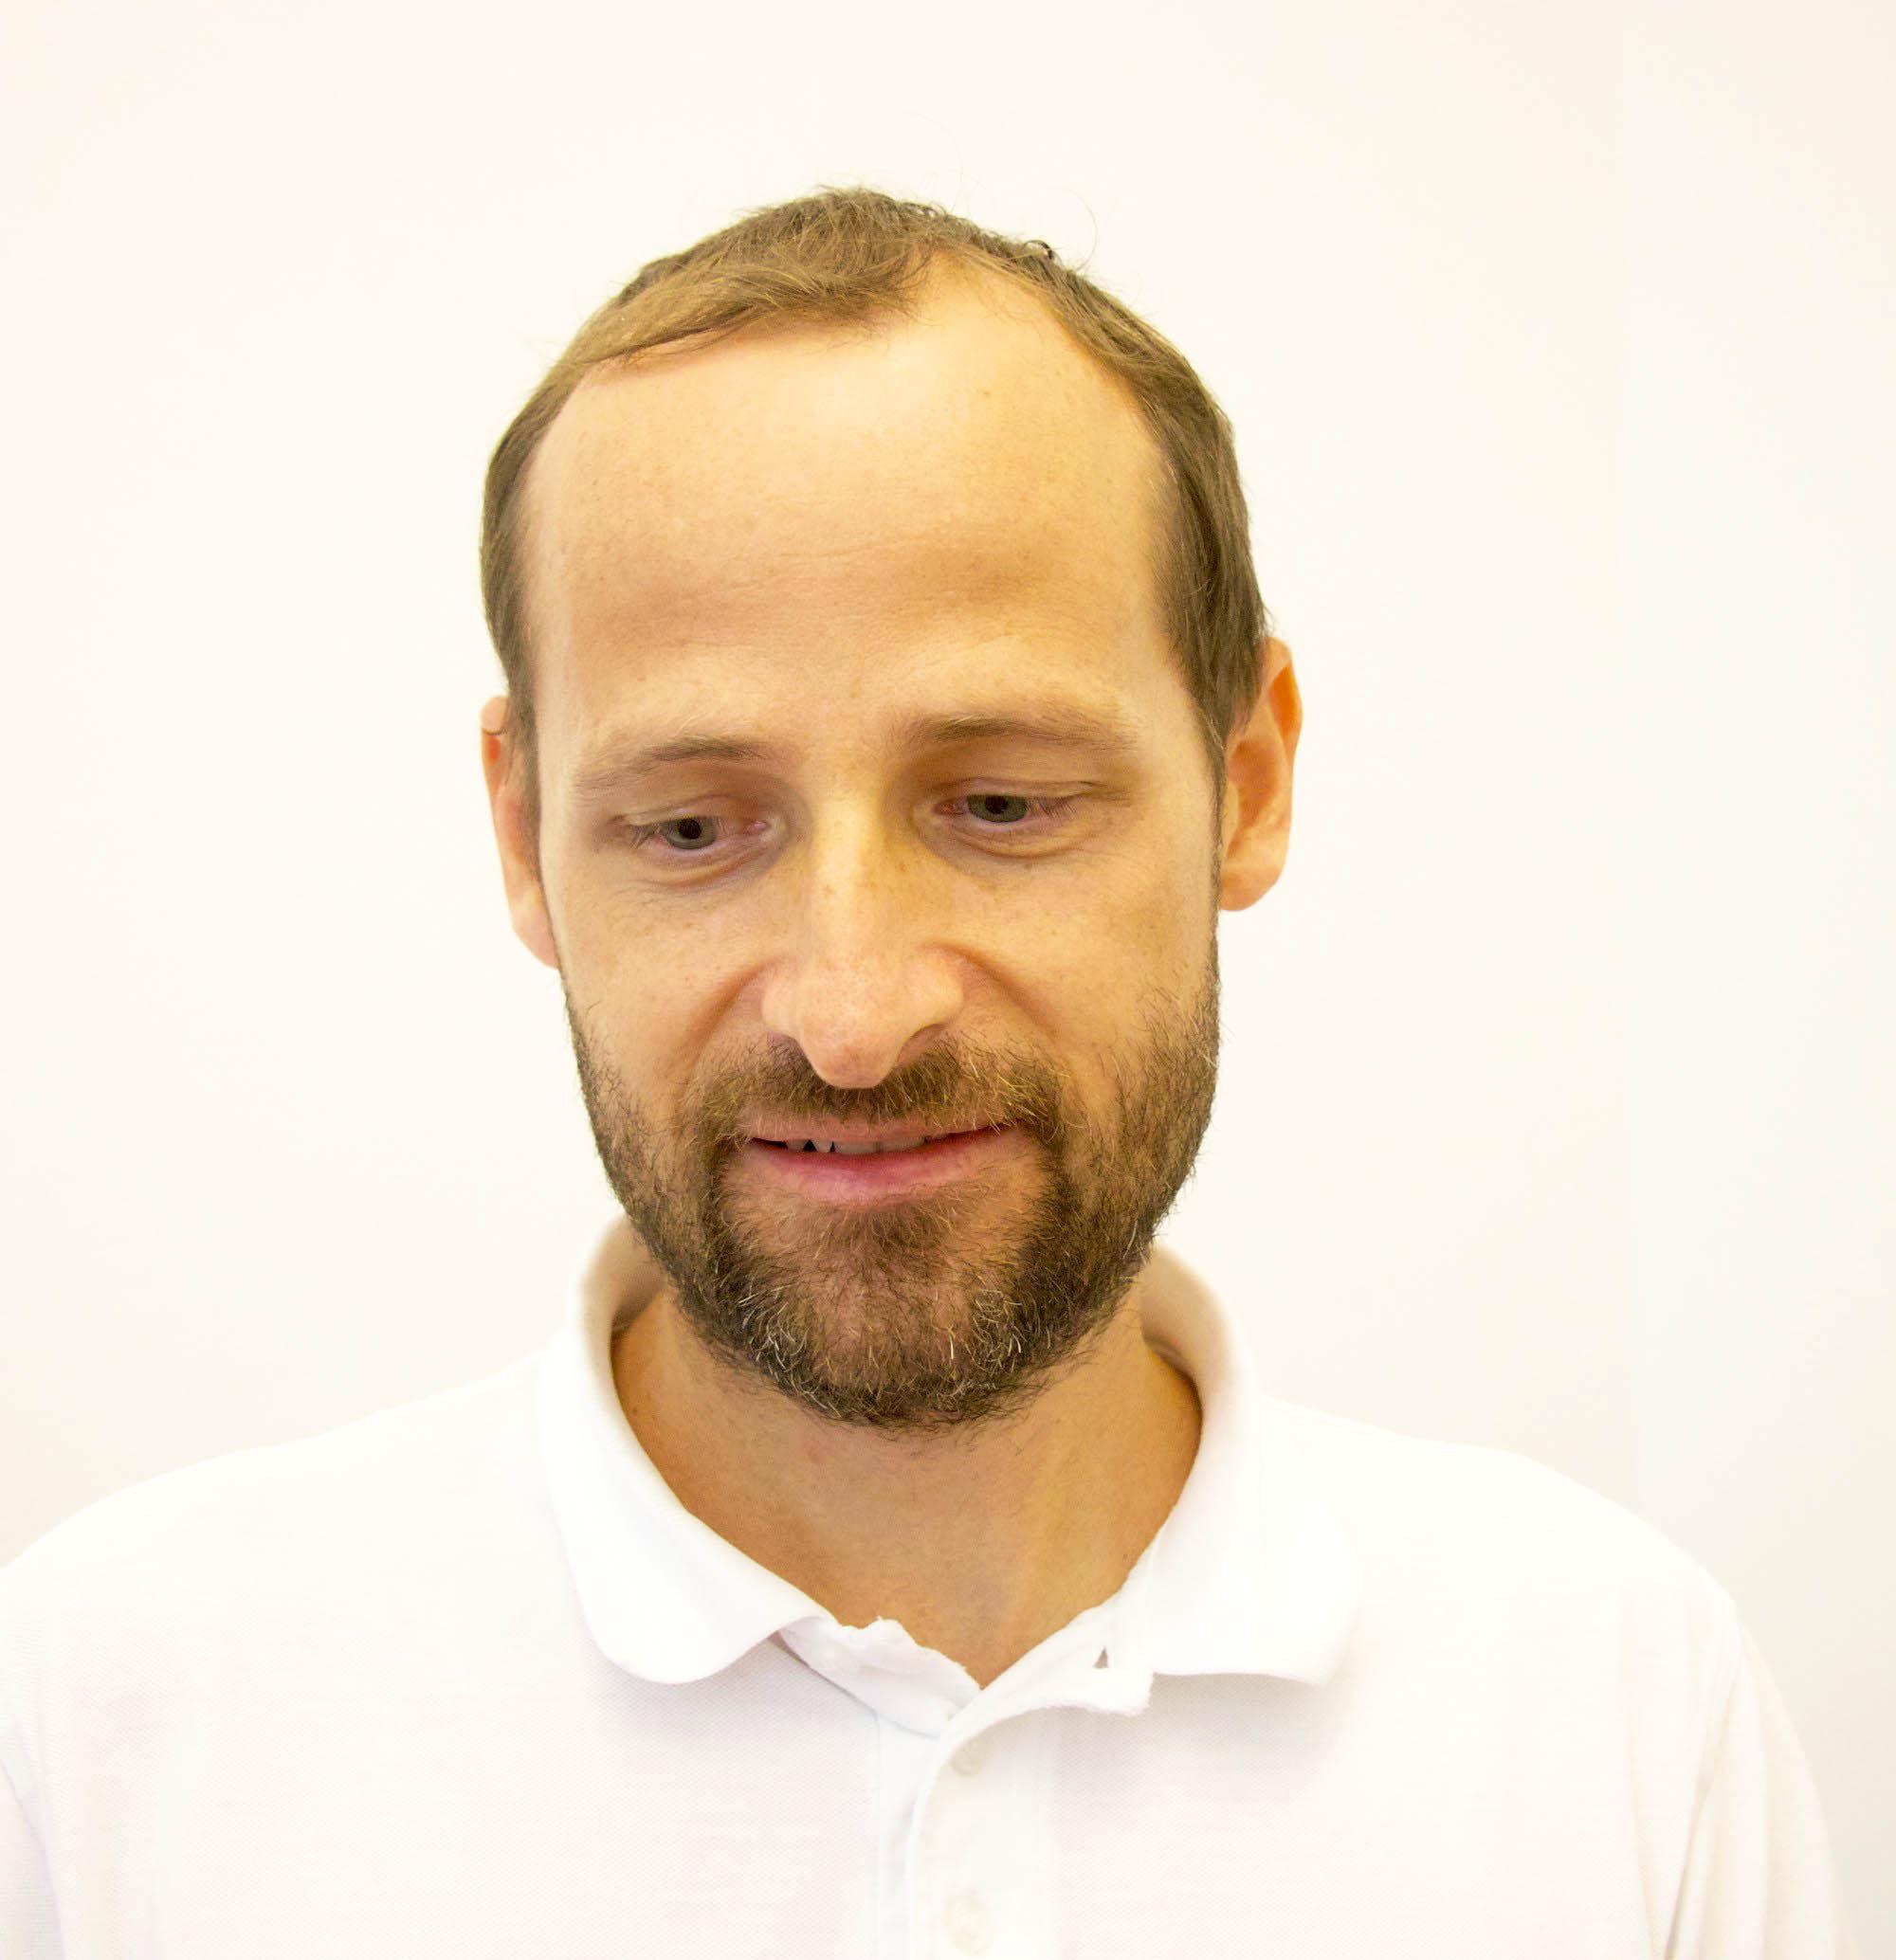 Olaf Schaefer